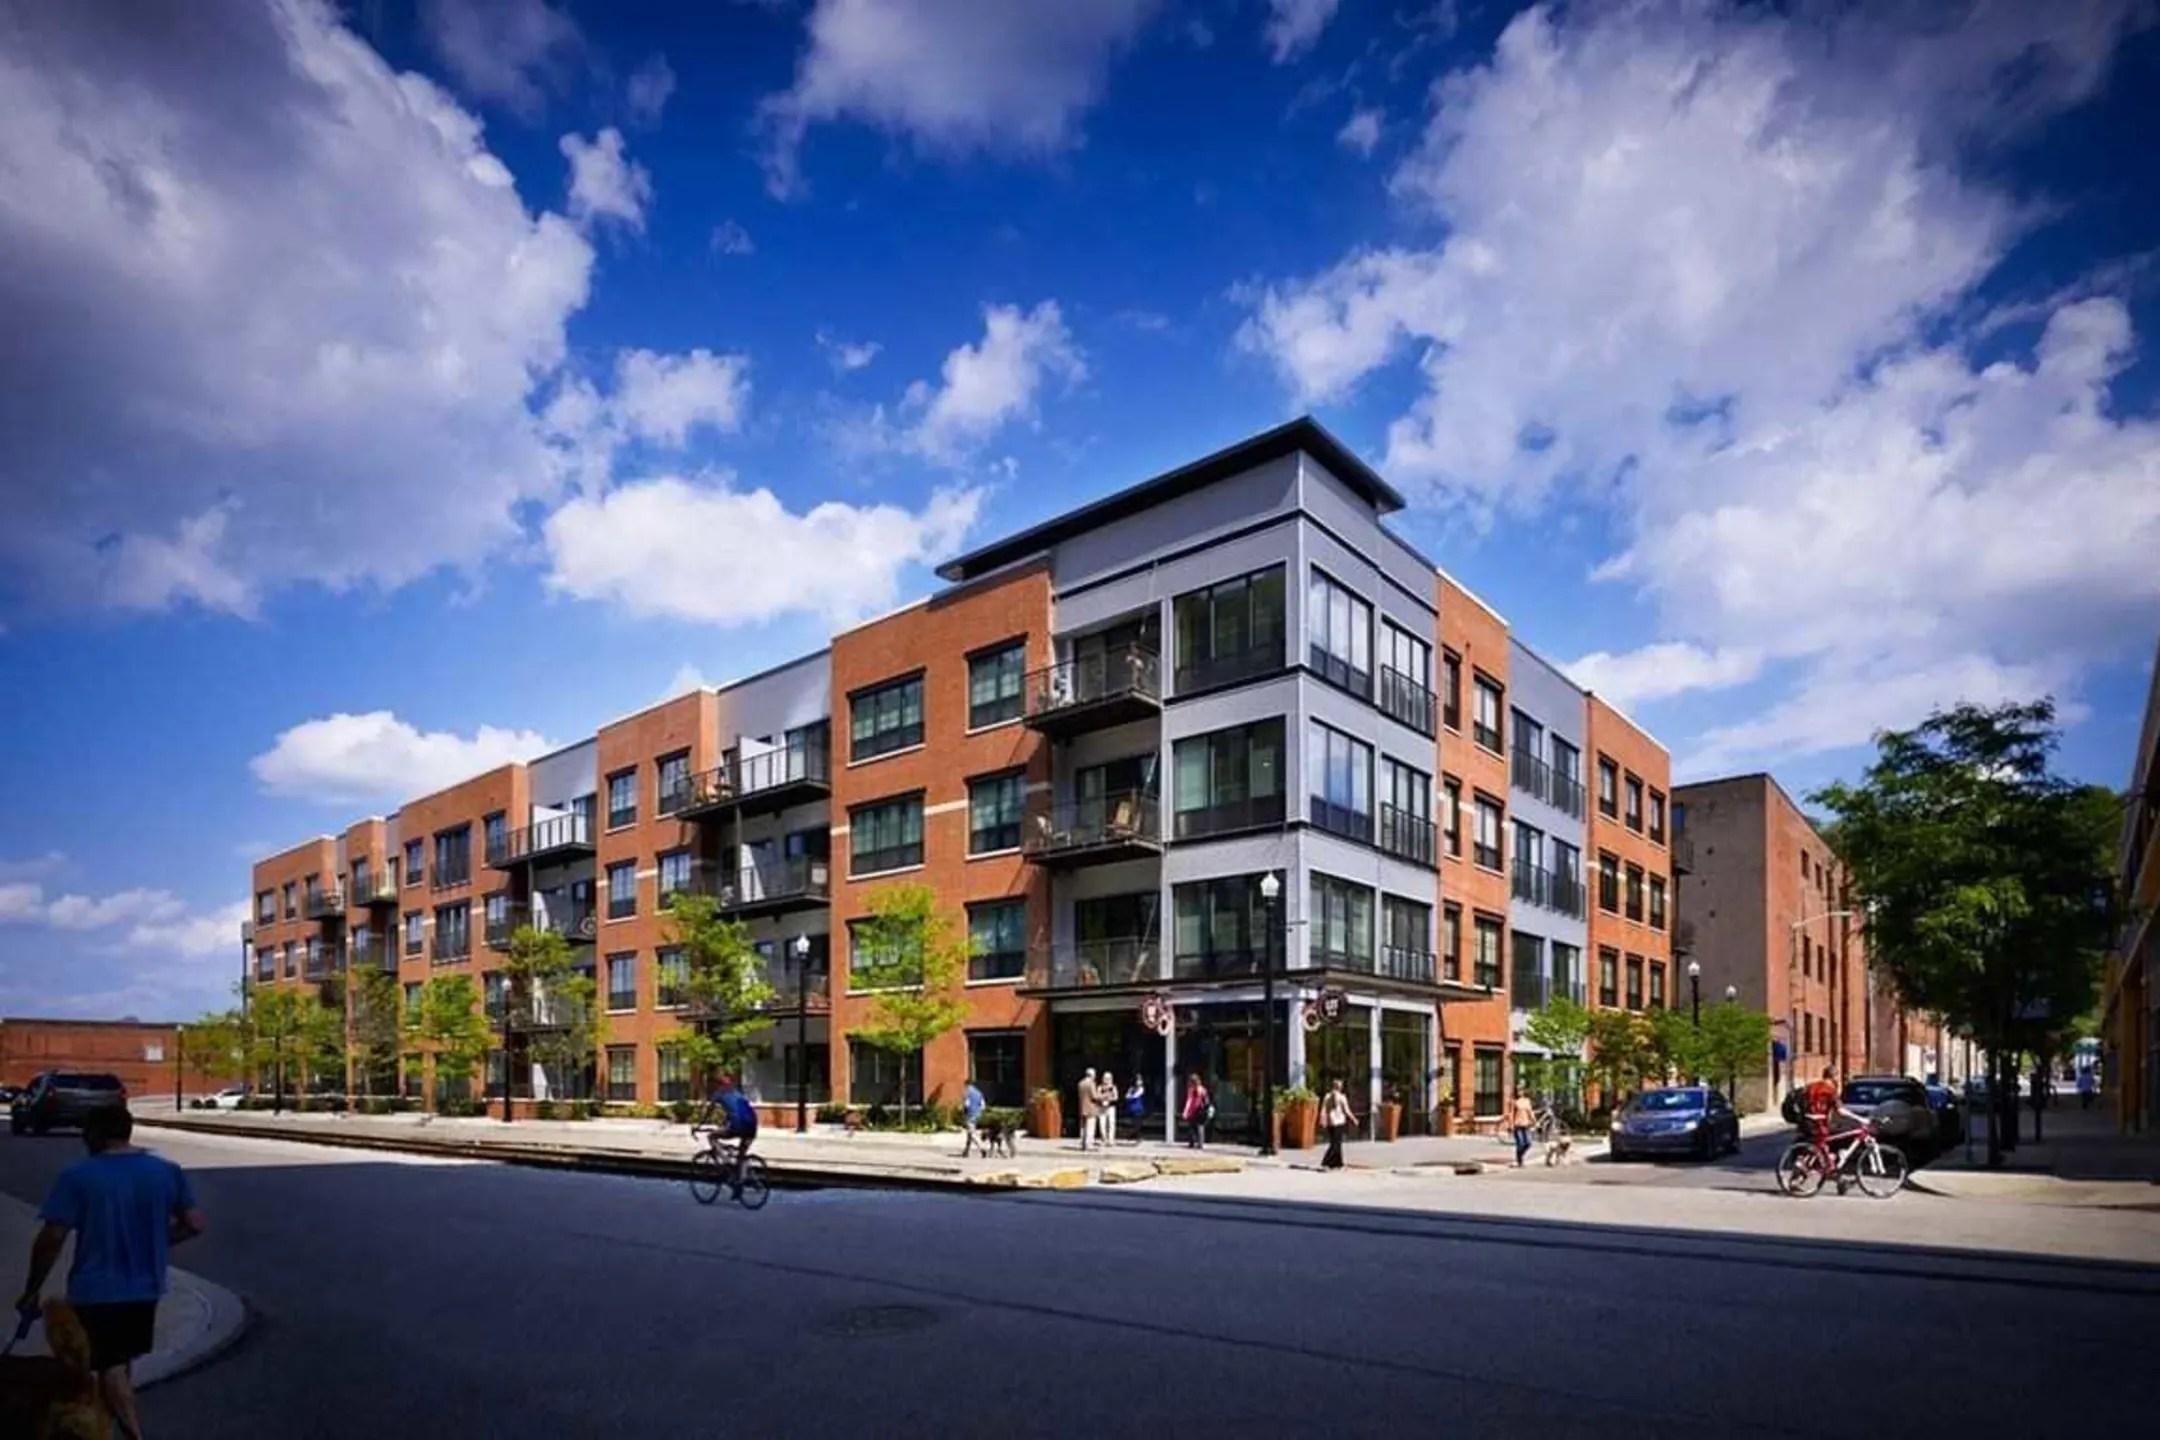 Lot 24 Apartments  Pittsburgh PA 15222